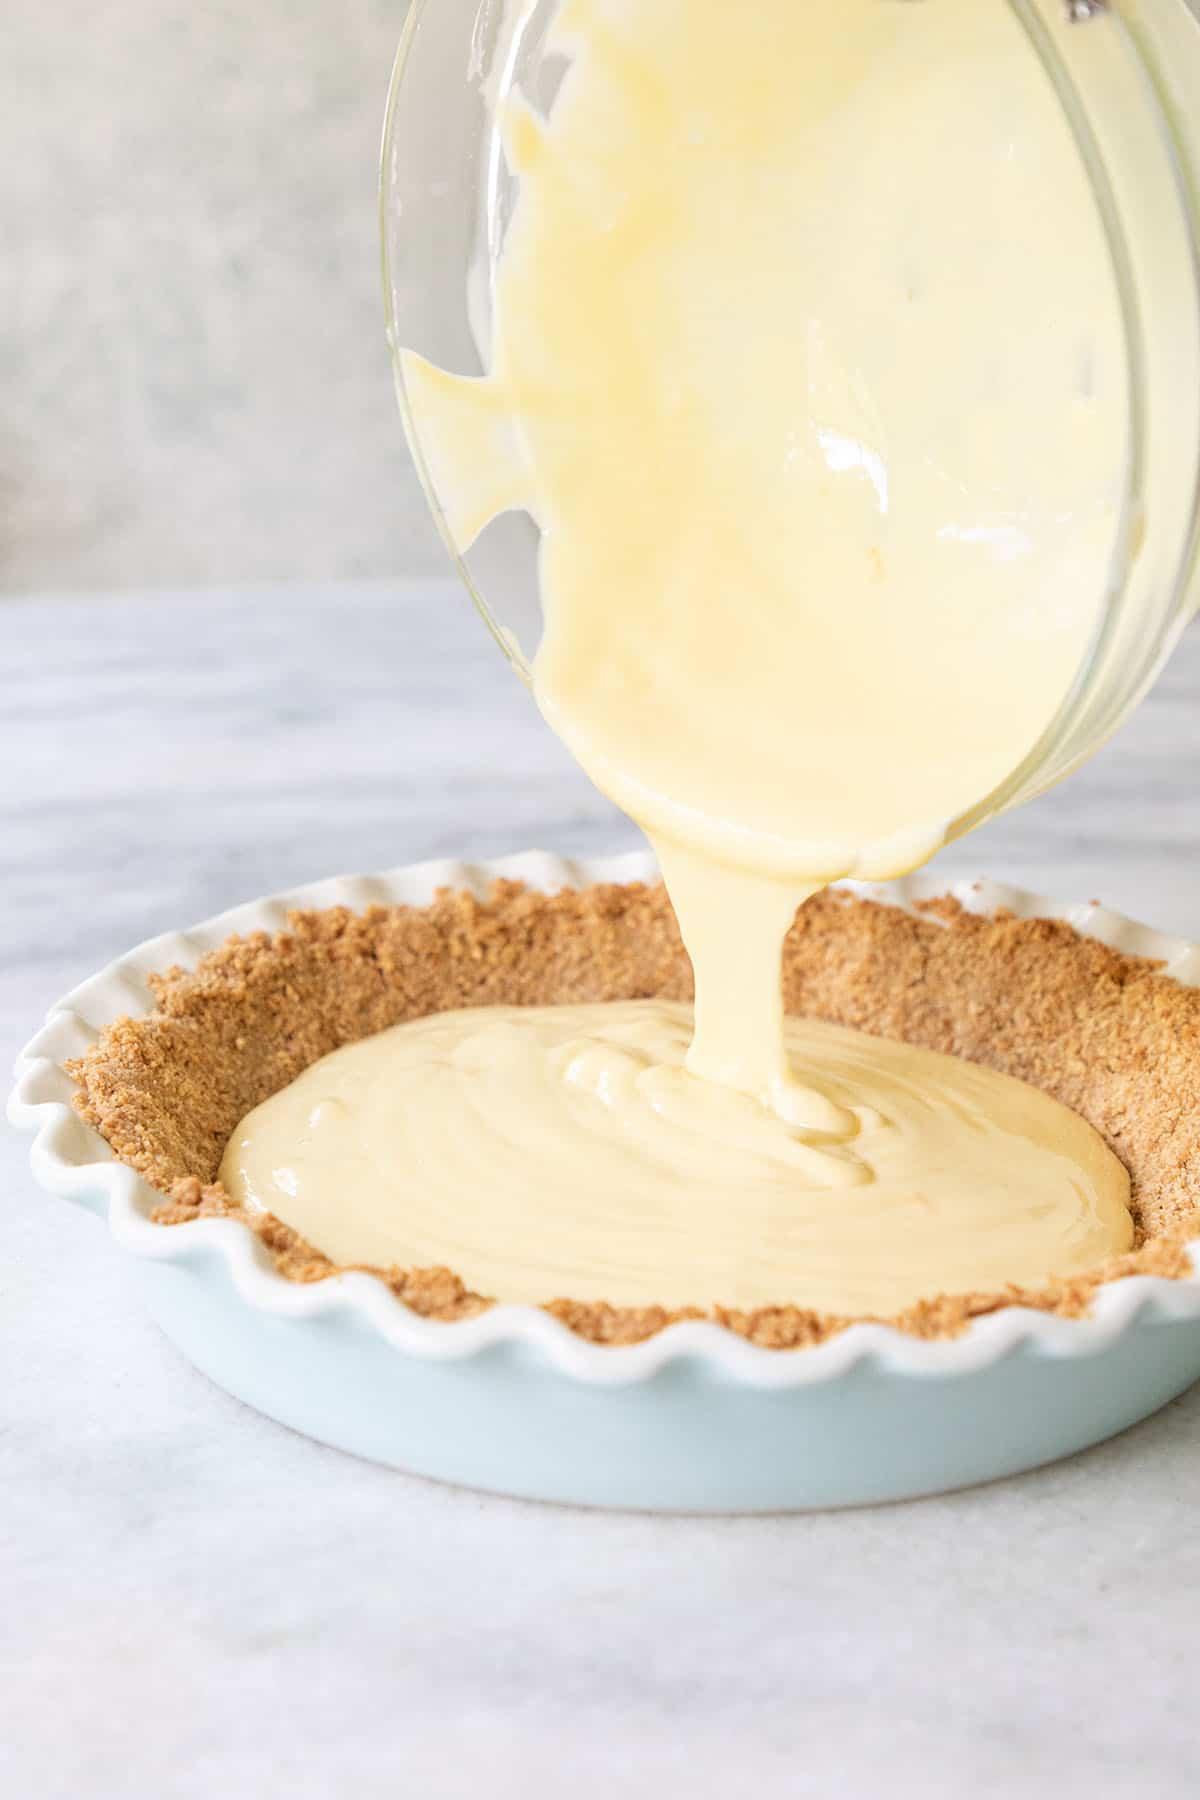 pouring lemonade pie filling into a pie dish